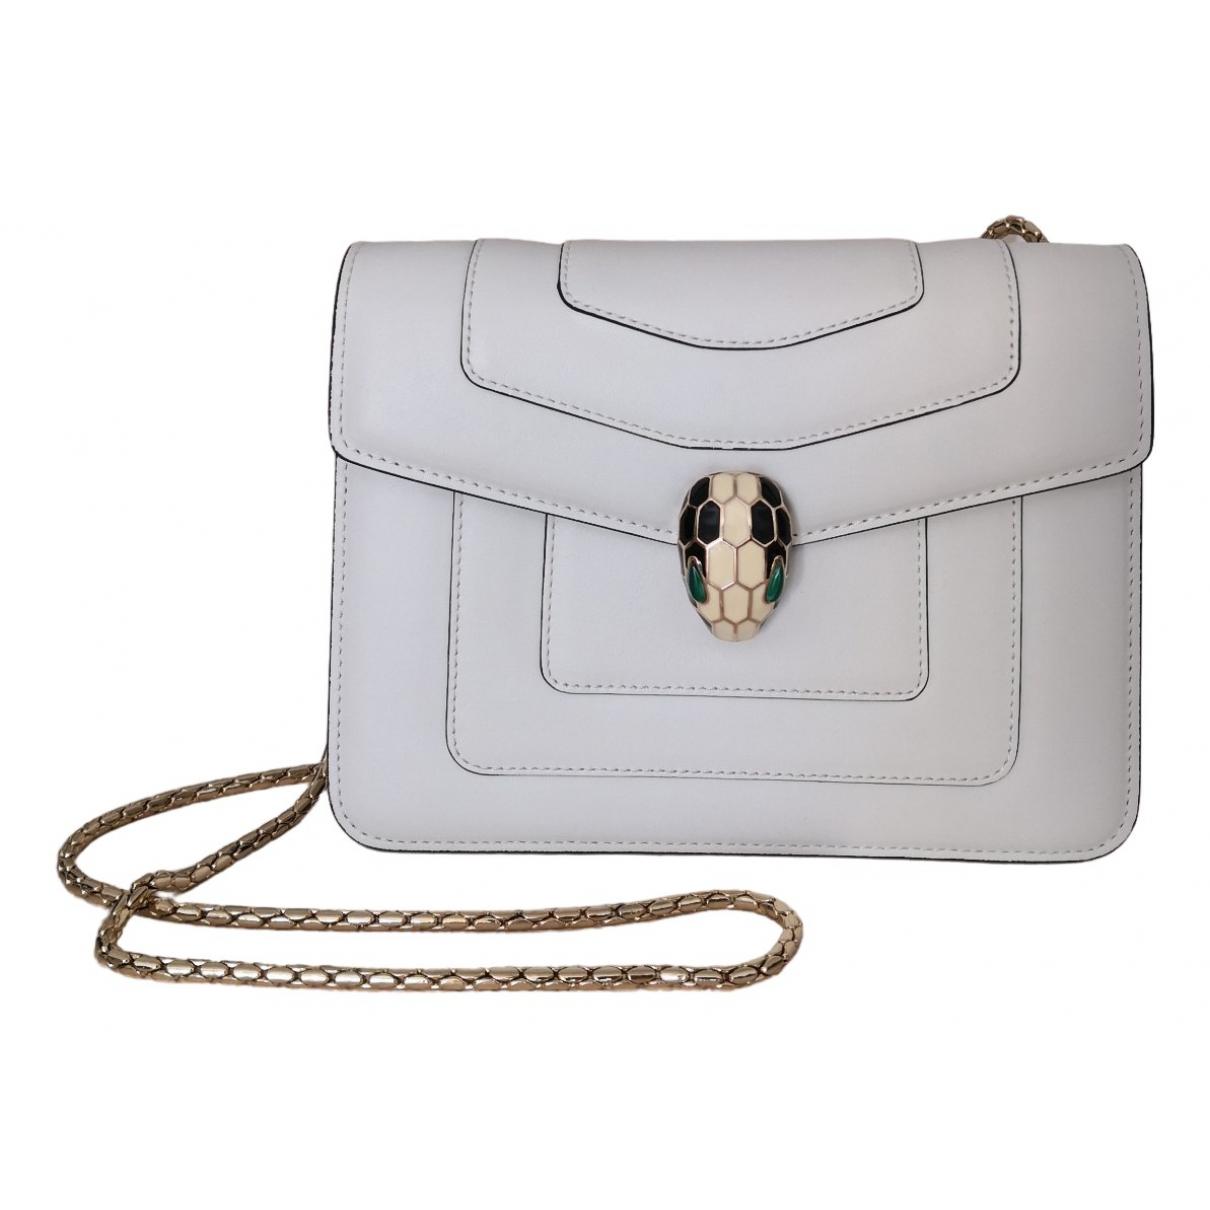 Bvlgari Serpenti White Leather handbag for Women \N